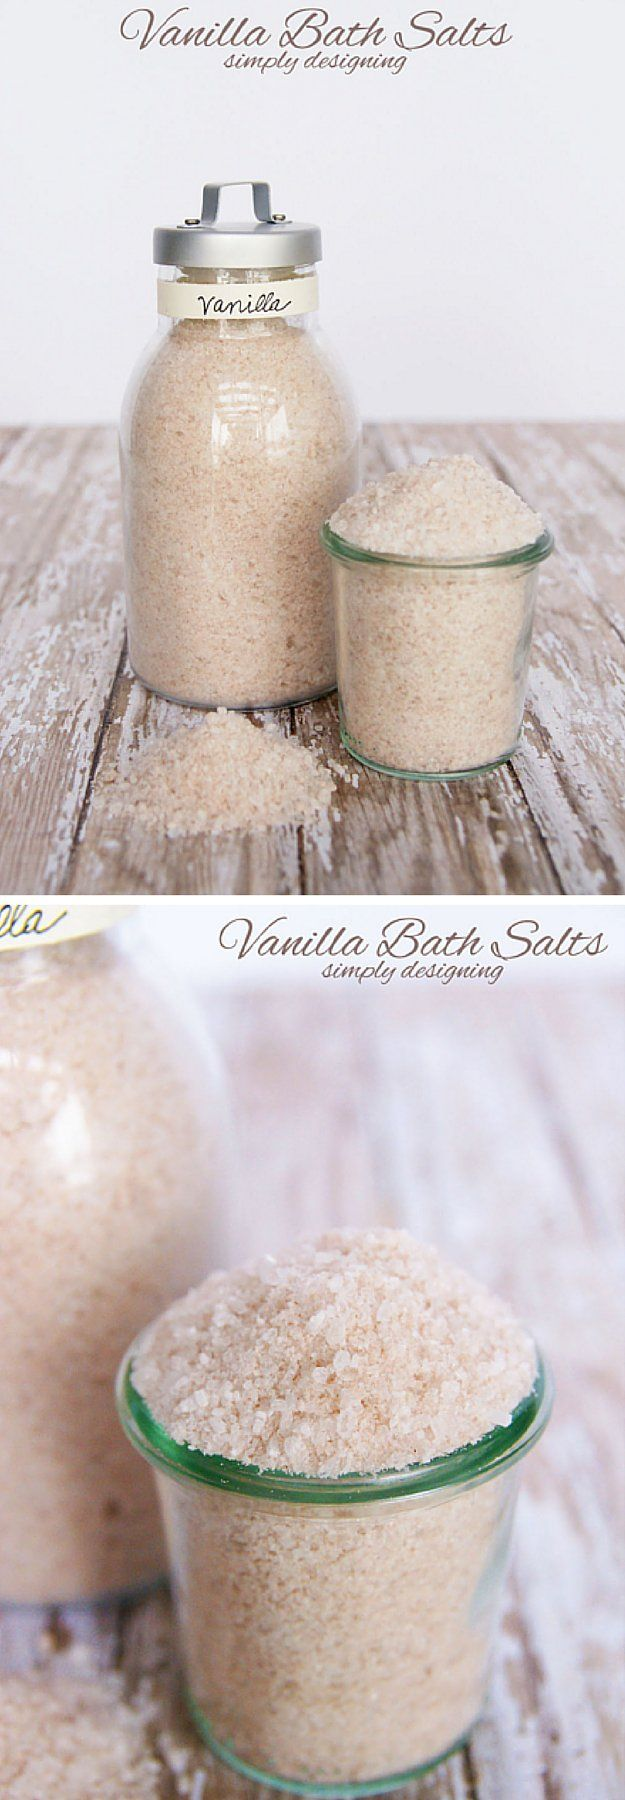 Vanilla Bath Salts|DIY Bath Salts